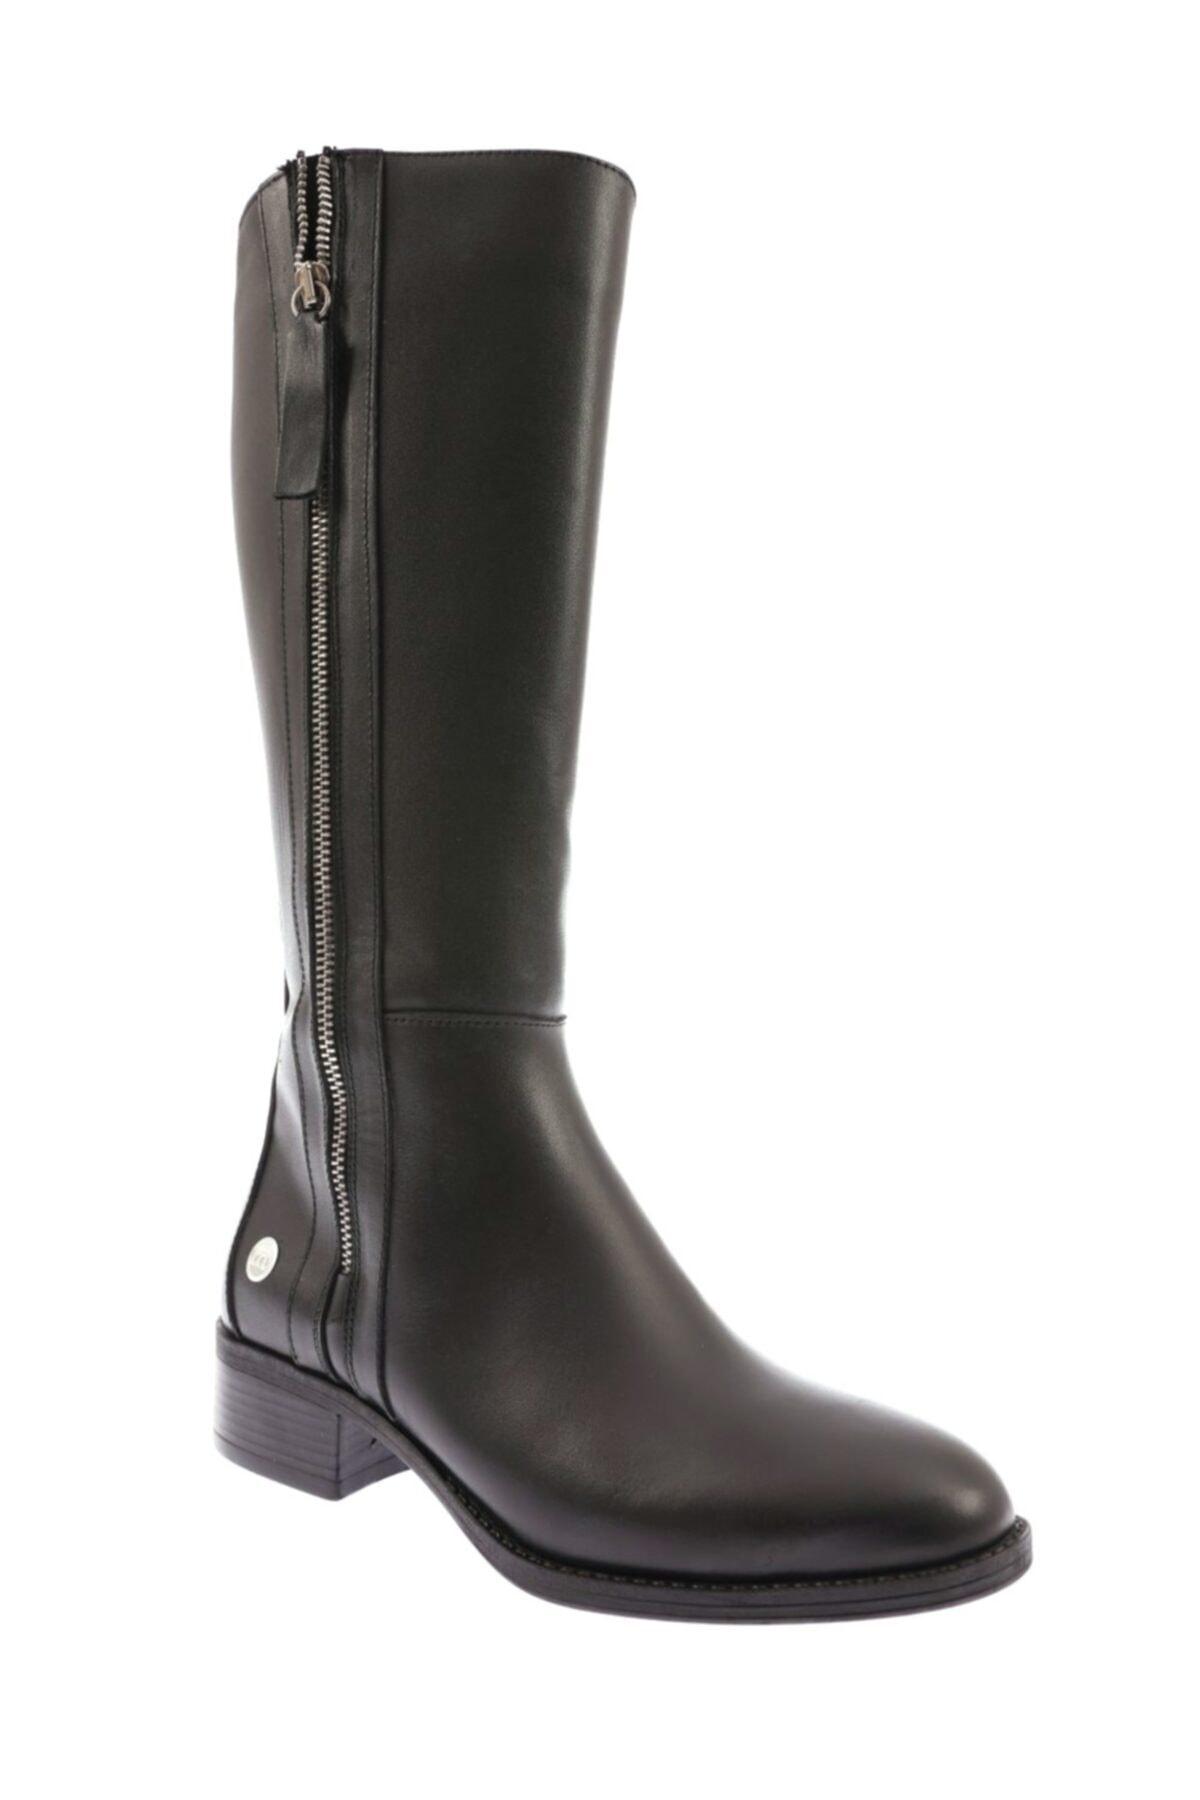 Mammamia D20kc-2000 Deri Kadın Çizme Siyah Faber 2